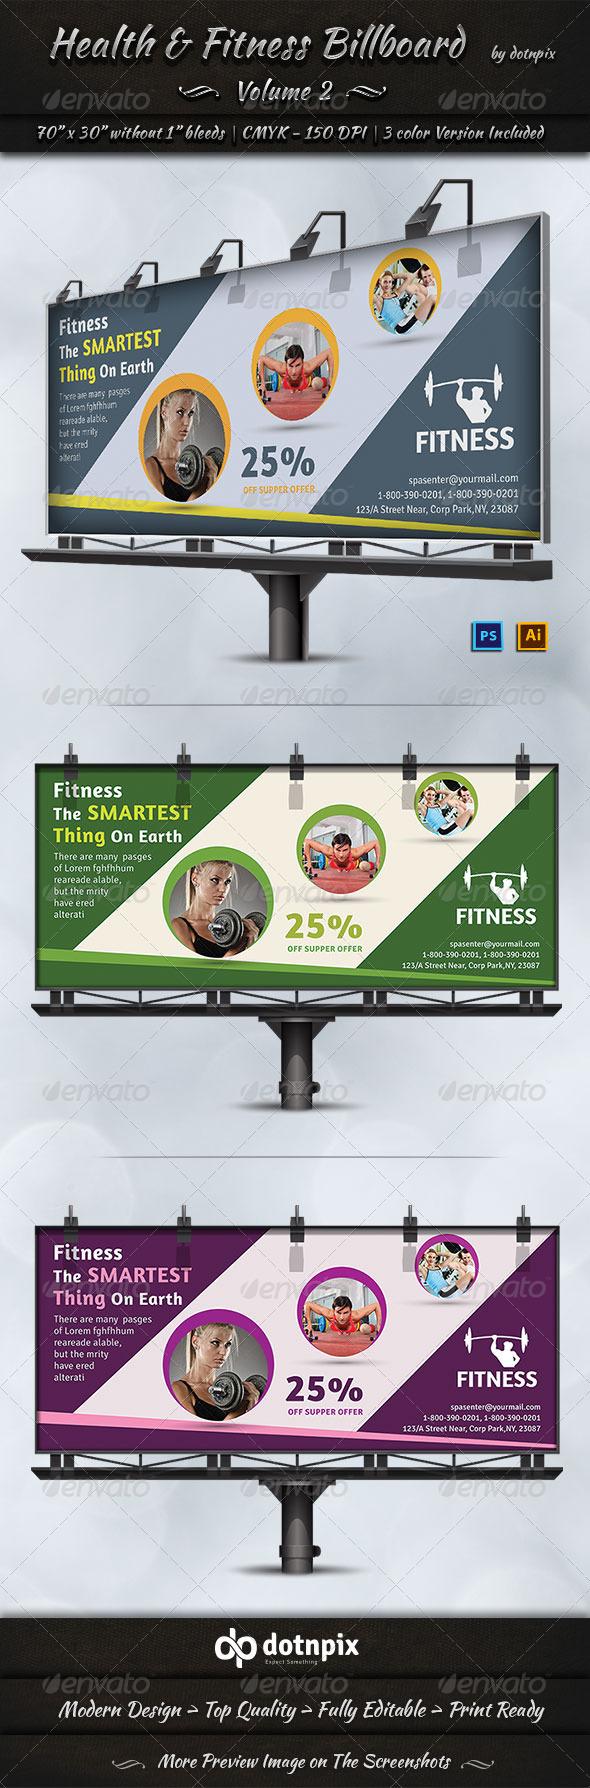 GraphicRiver Health & Fitness Billboard Template Volume 2 7571615